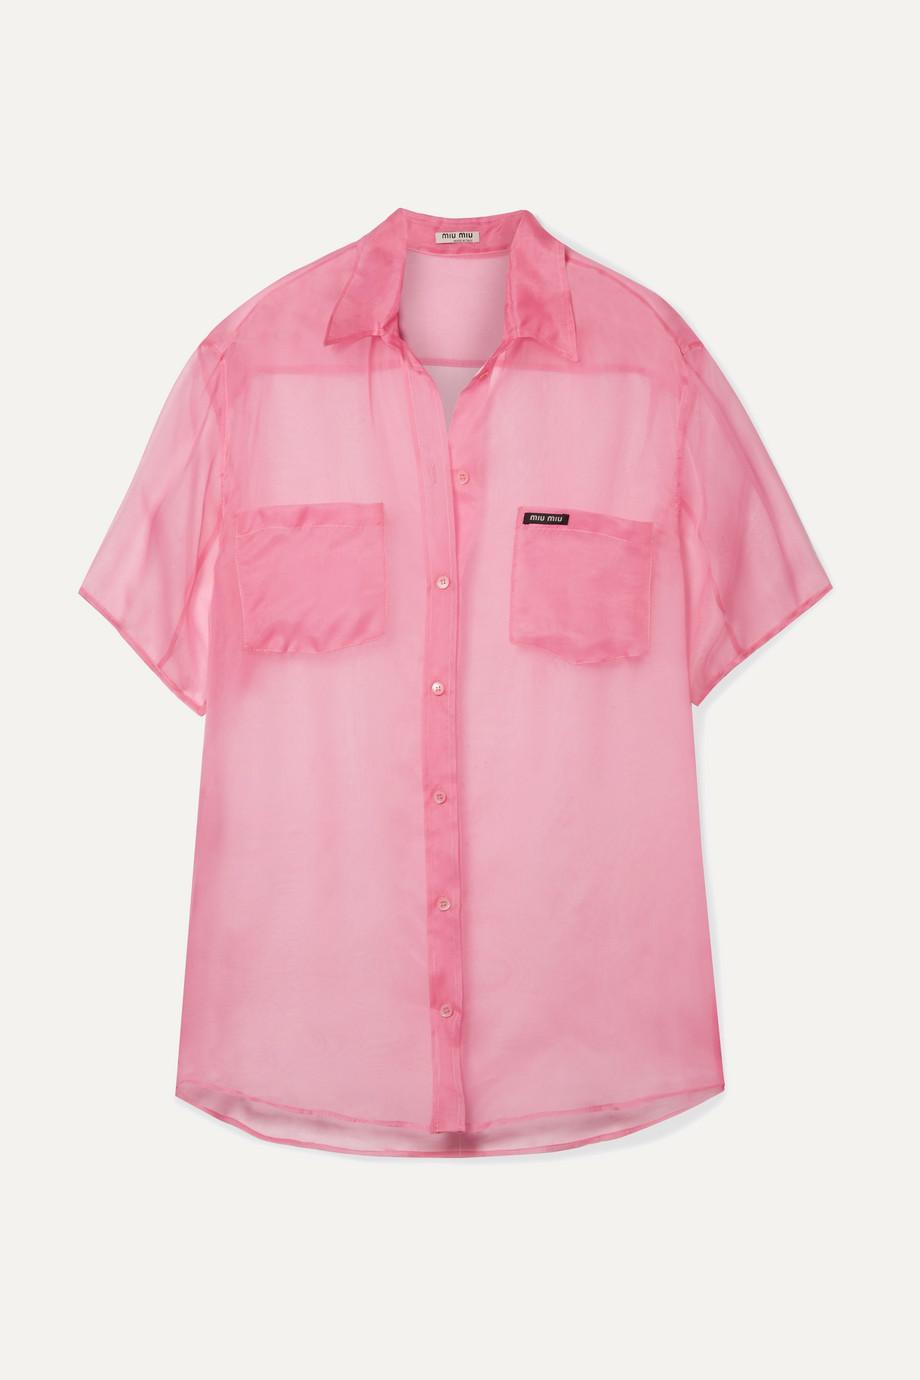 Miu Miu Oversized silk-organza shirt